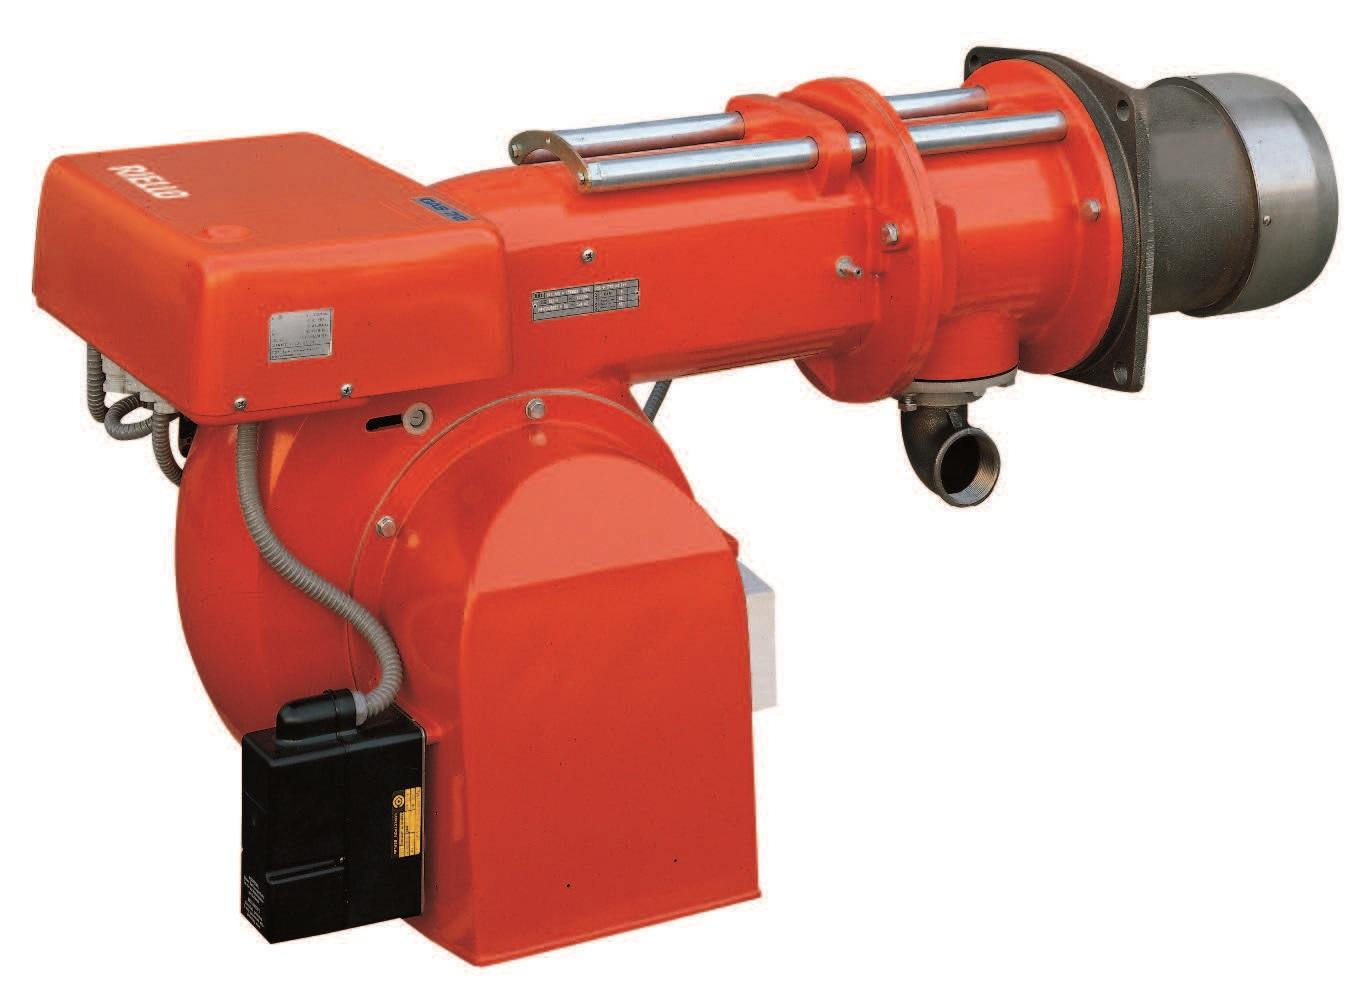 riello gas burner manual wiring diagram database u2022 rh itgenergy co Riello Burner Parts Riello Oil Burner Manual